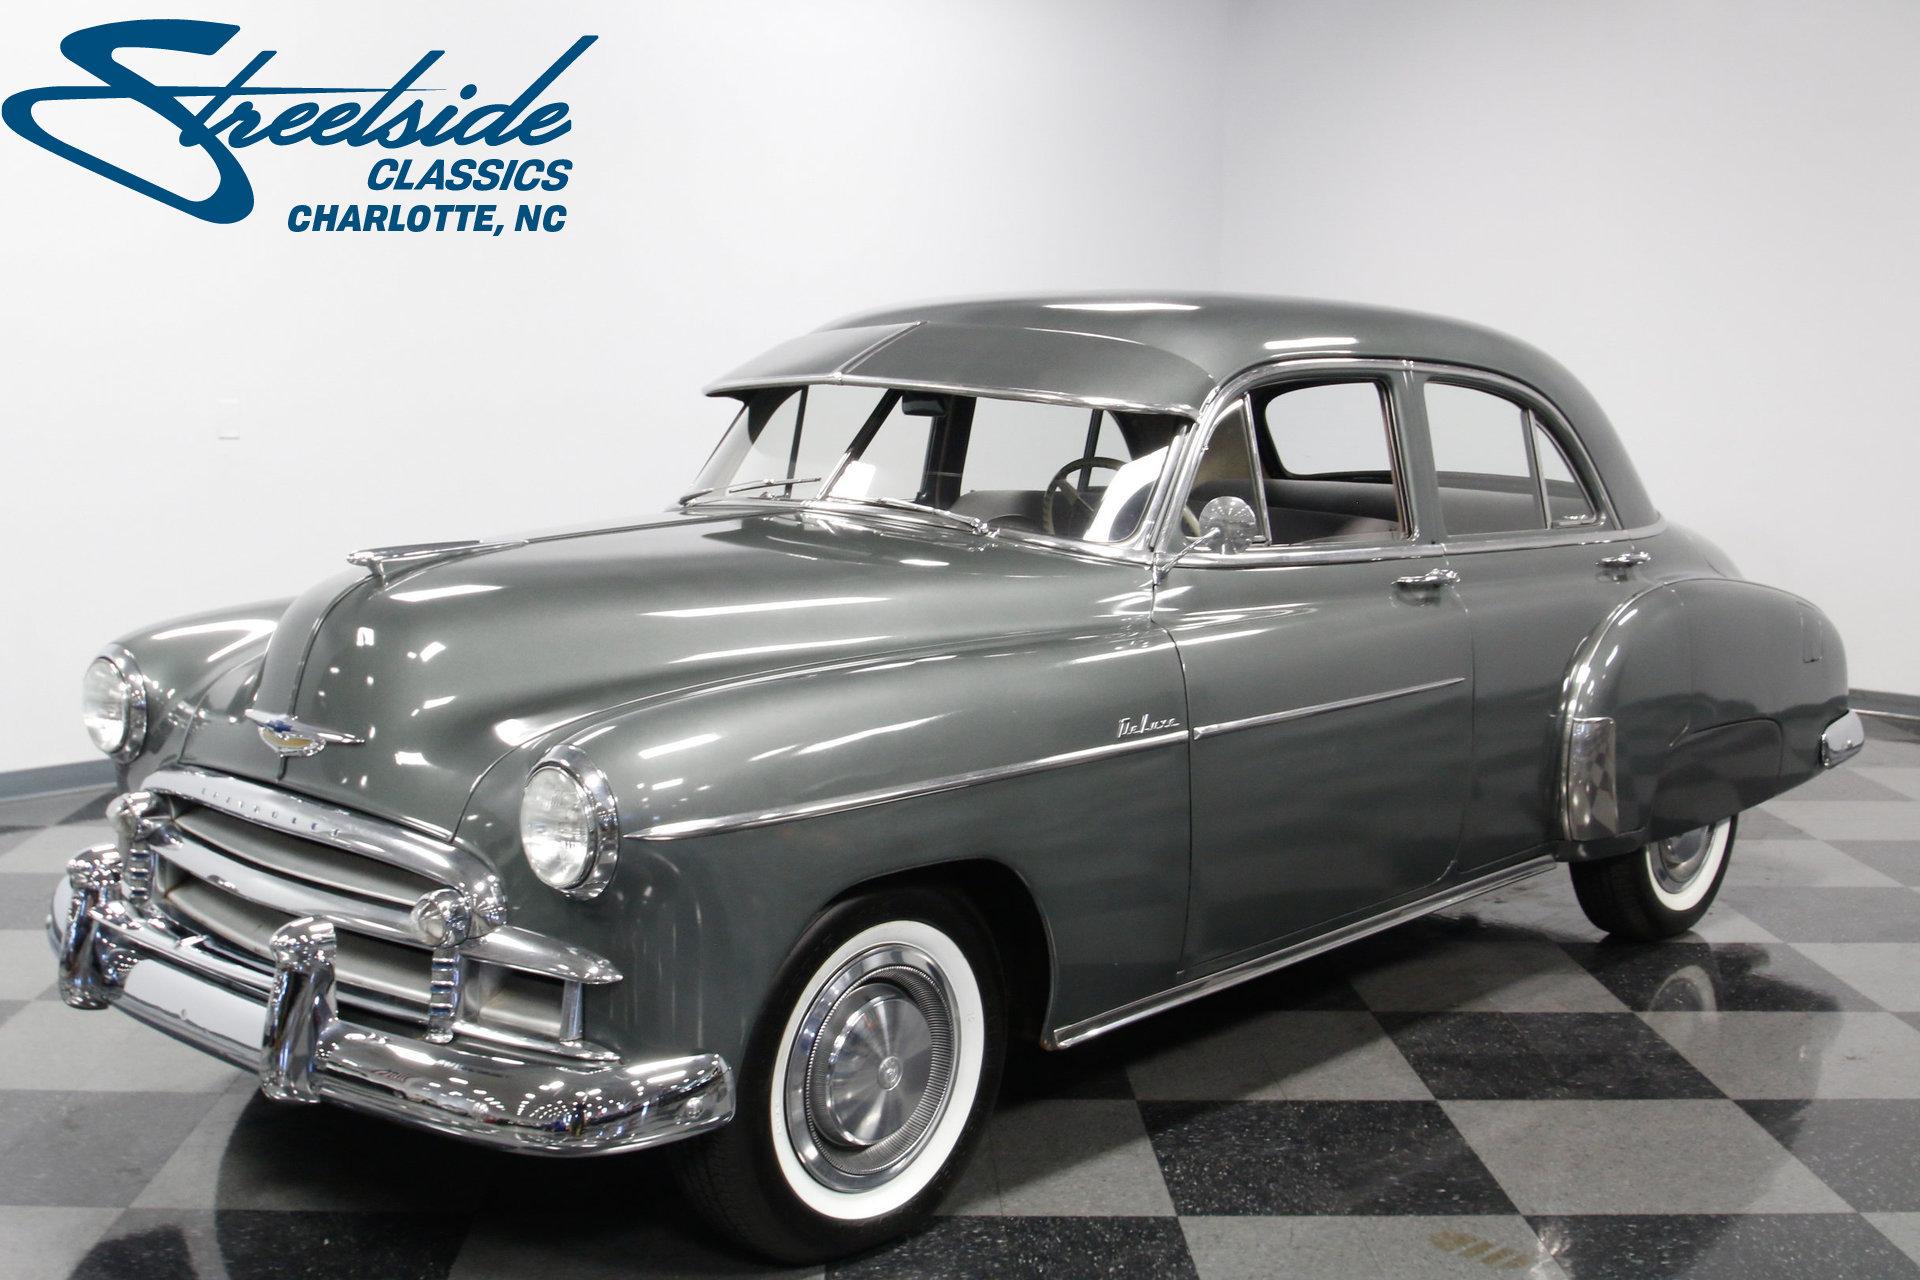 1950 Chevrolet Styleline Deluxe For Sale 75477 Mcg